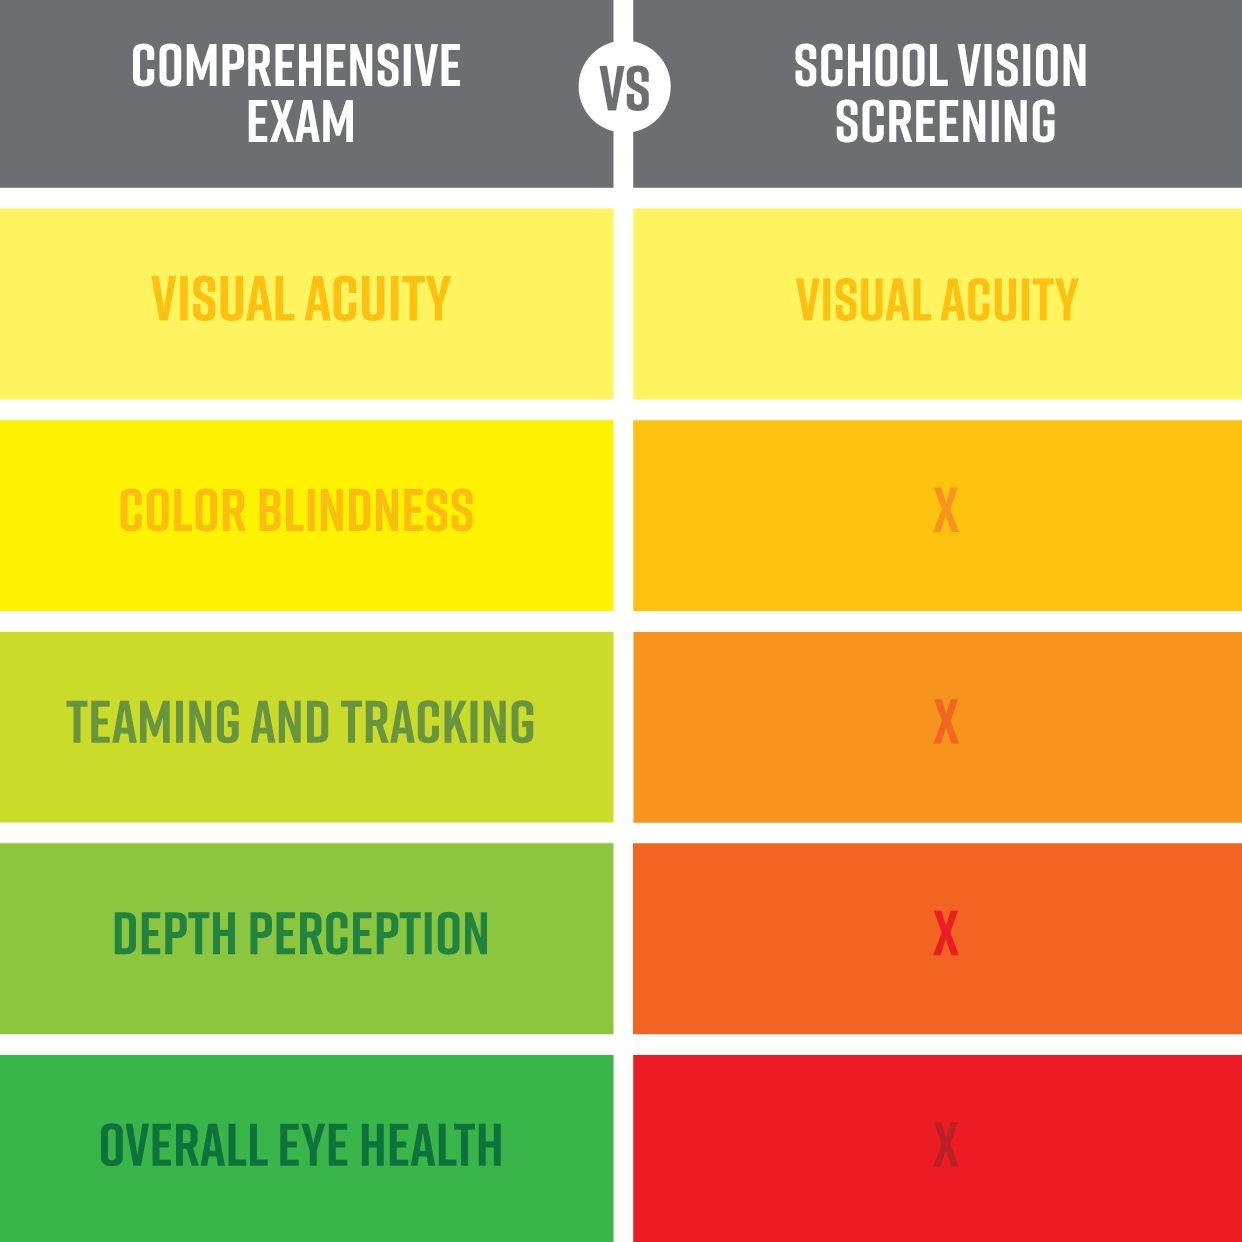 School Vision Screenings Can Be Helpful But Comprehensive